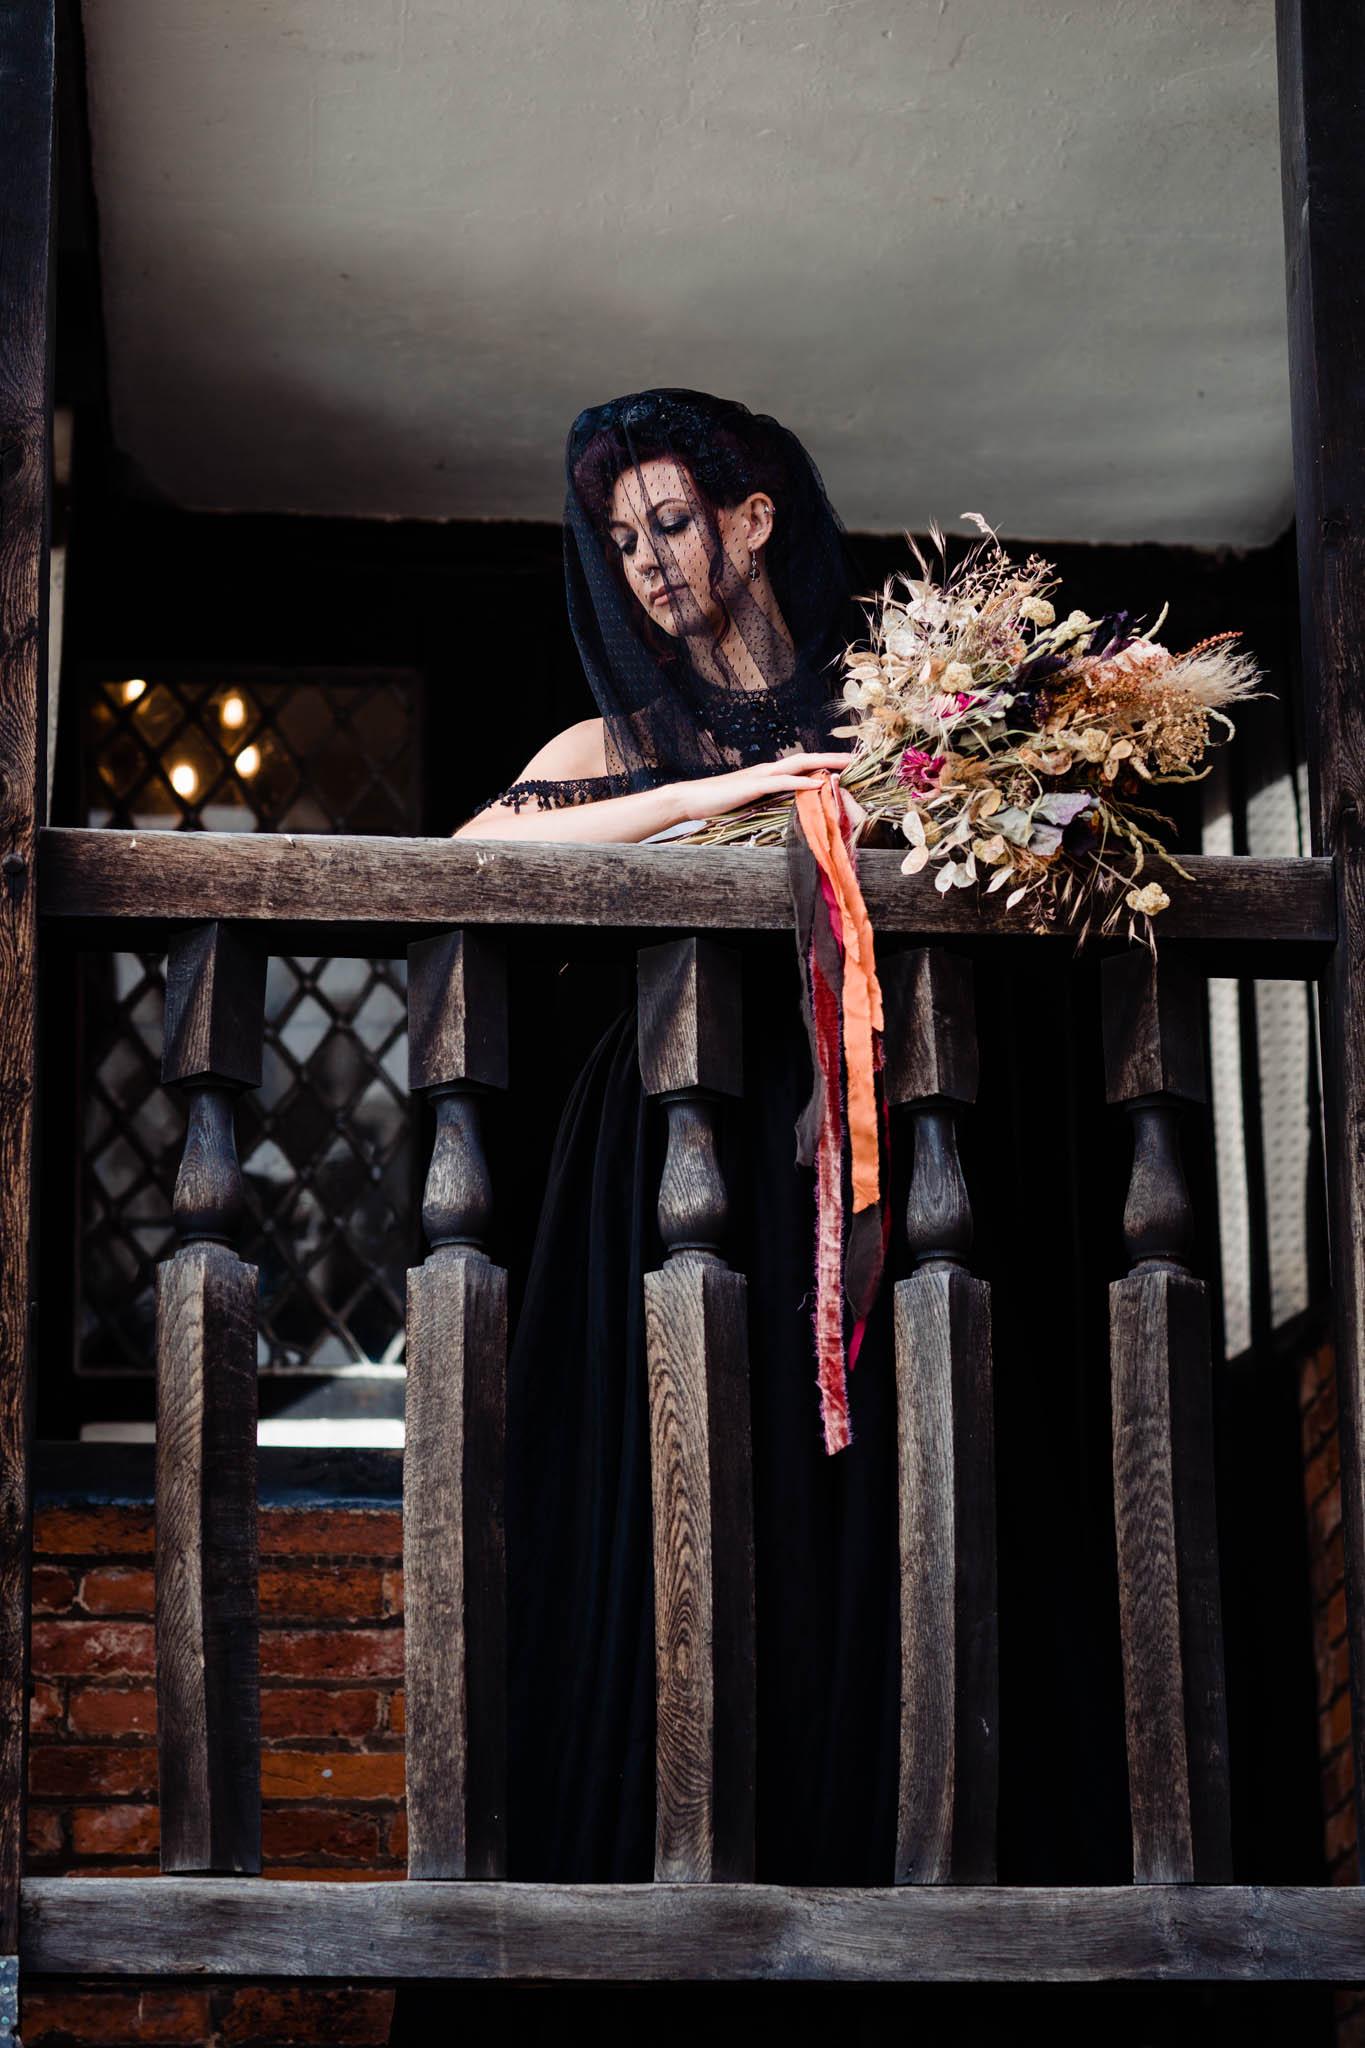 halloween wedding - bride in black wedding dress and black veil - autumn gothic wedding